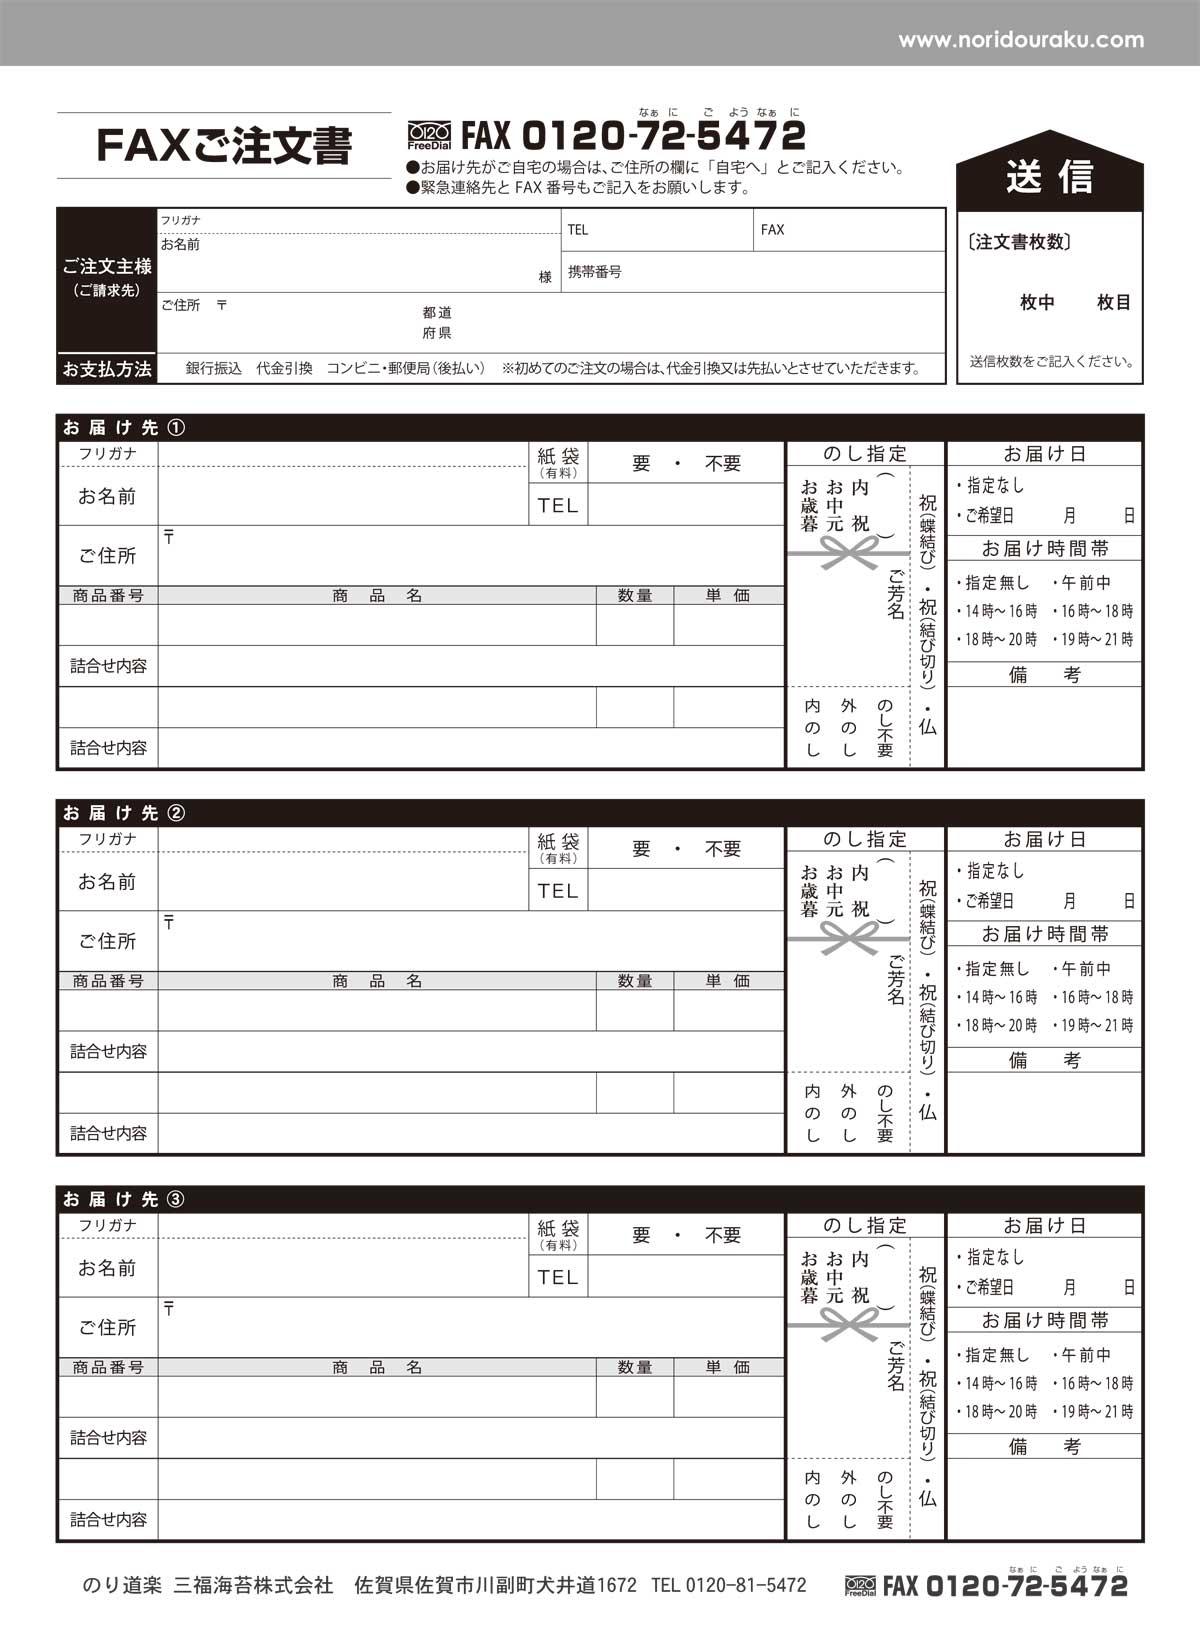 fax注文用紙イメージ